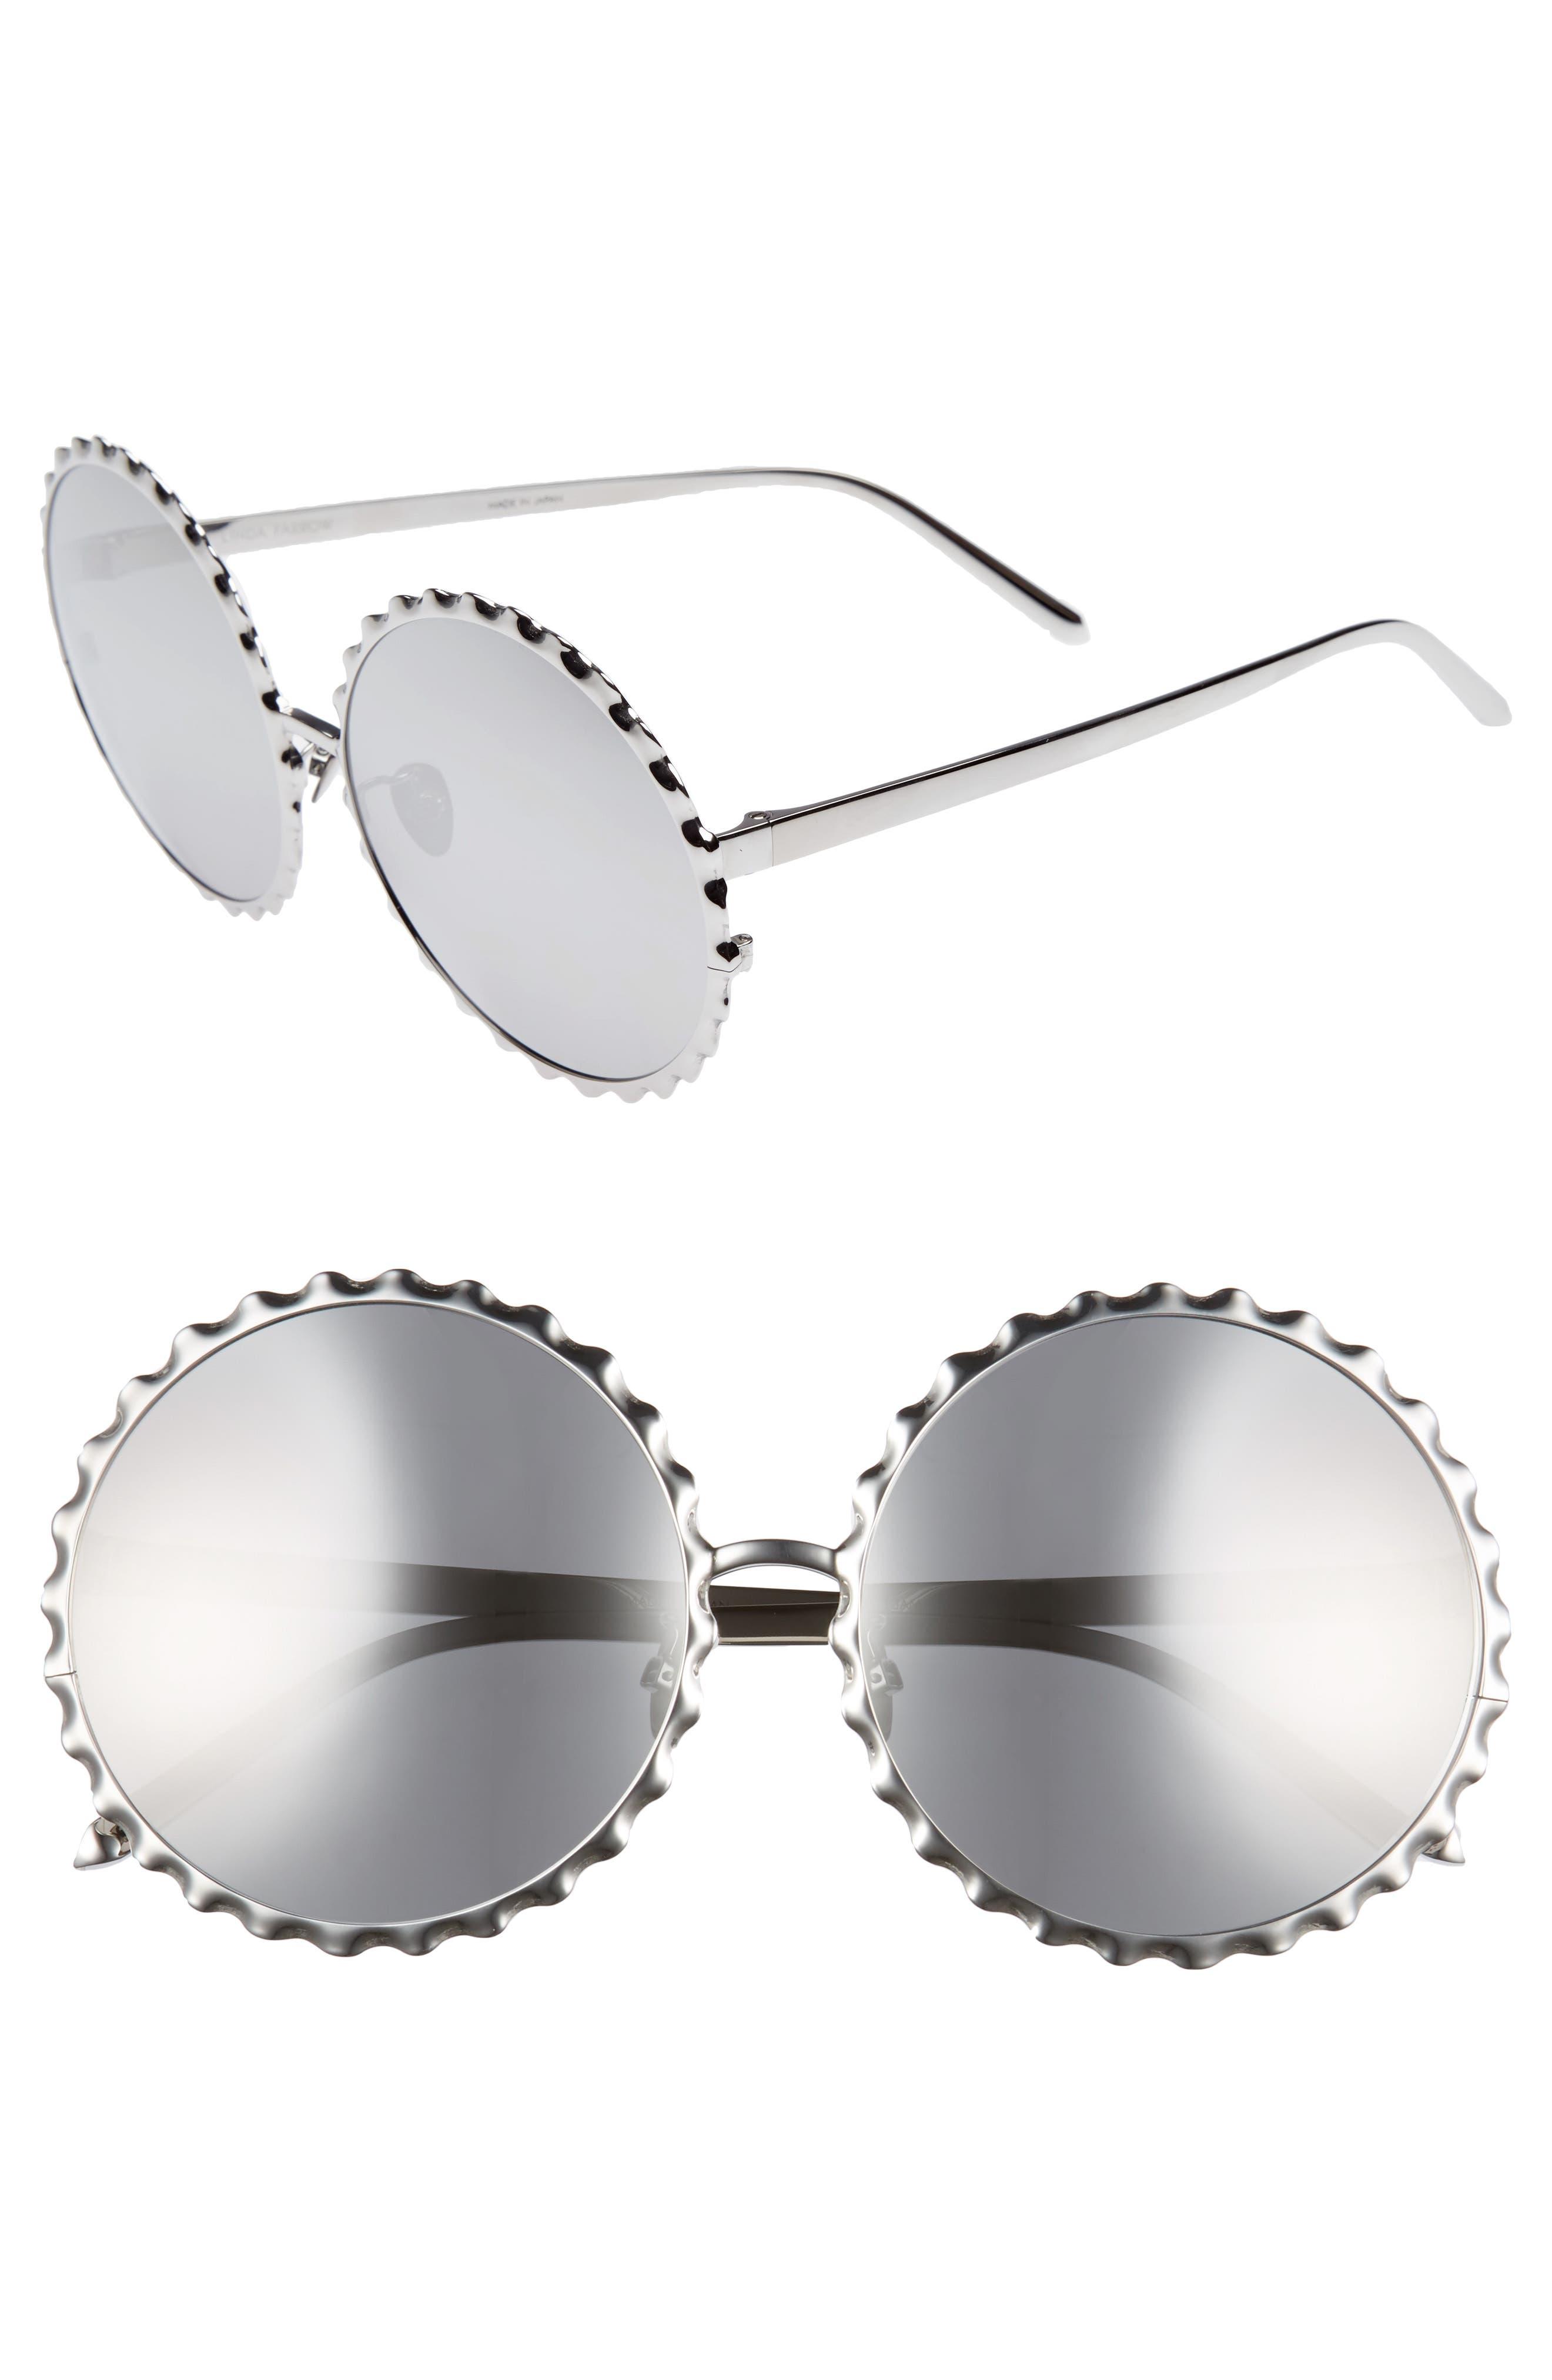 59mm Mirrored 18 Karat Gold Trim Round Sunglasses,                         Main,                         color, 710